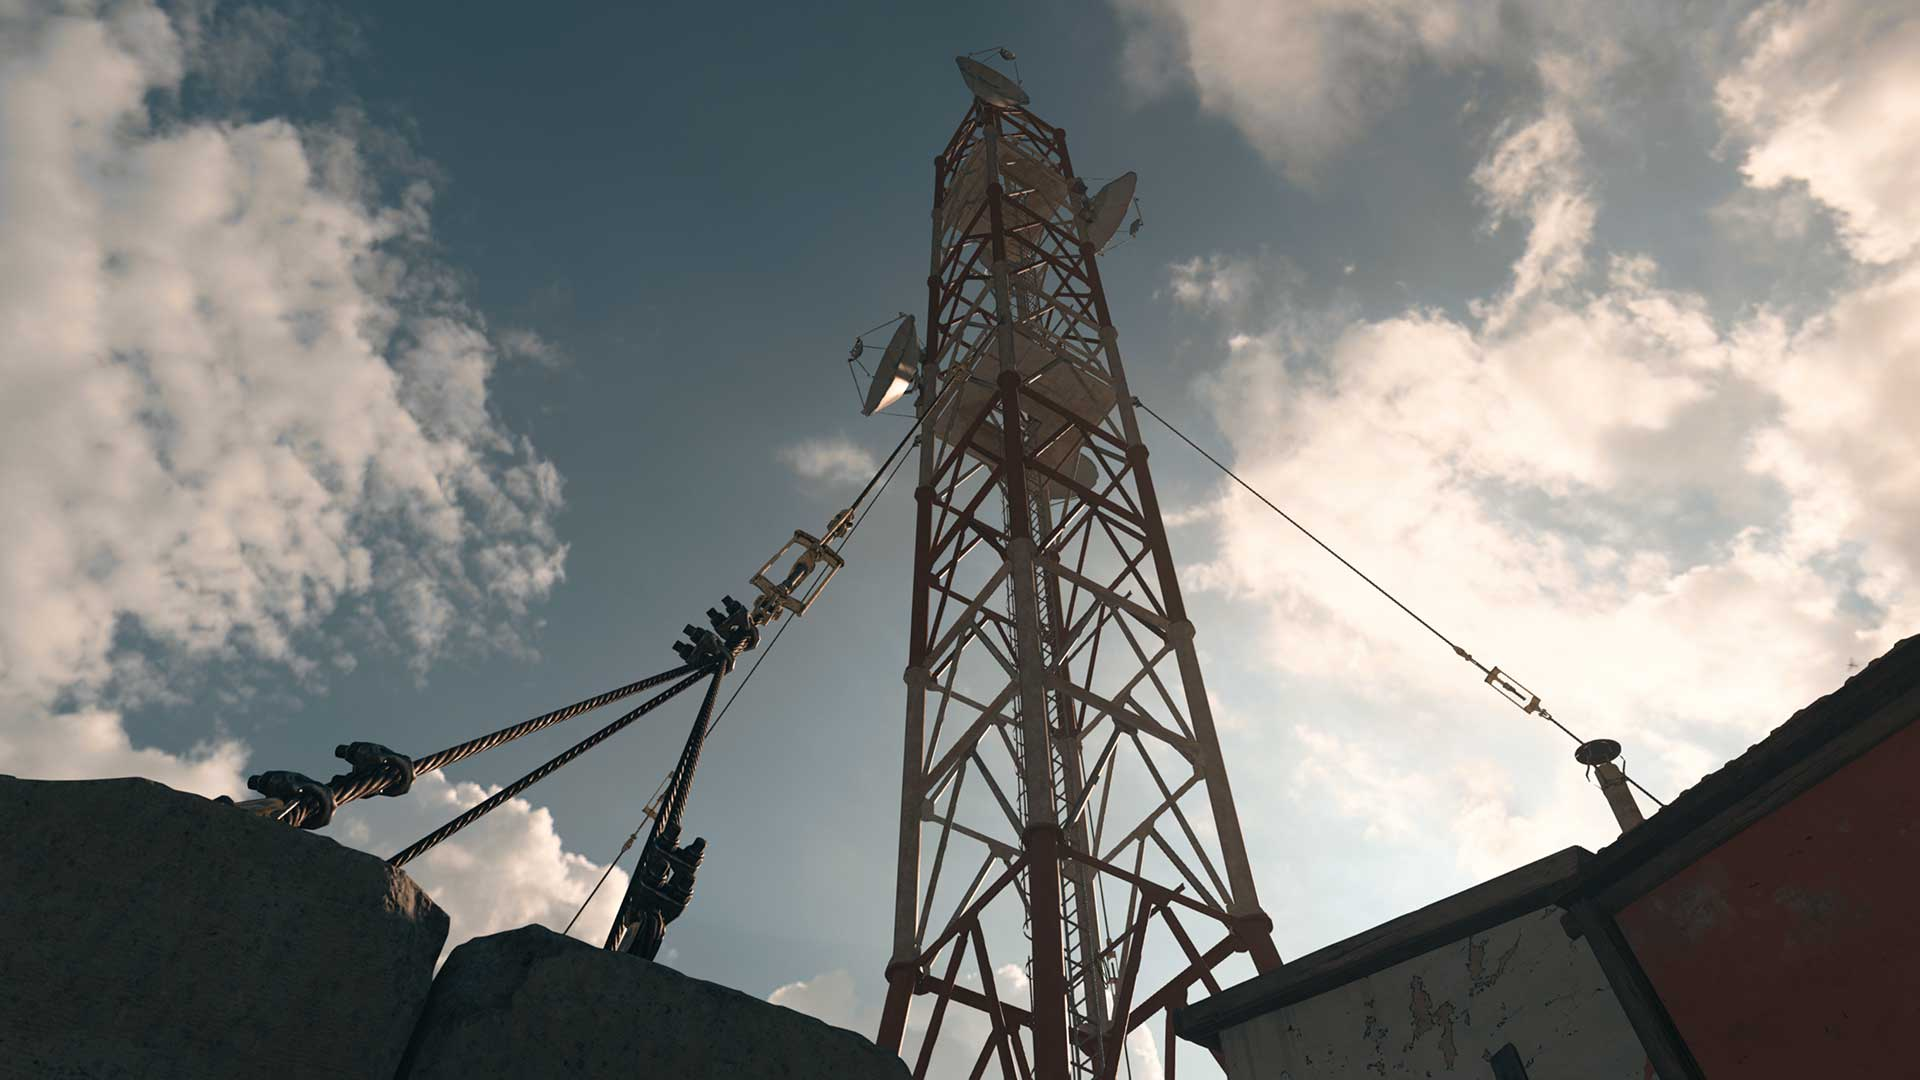 Towering Over the Junkyard